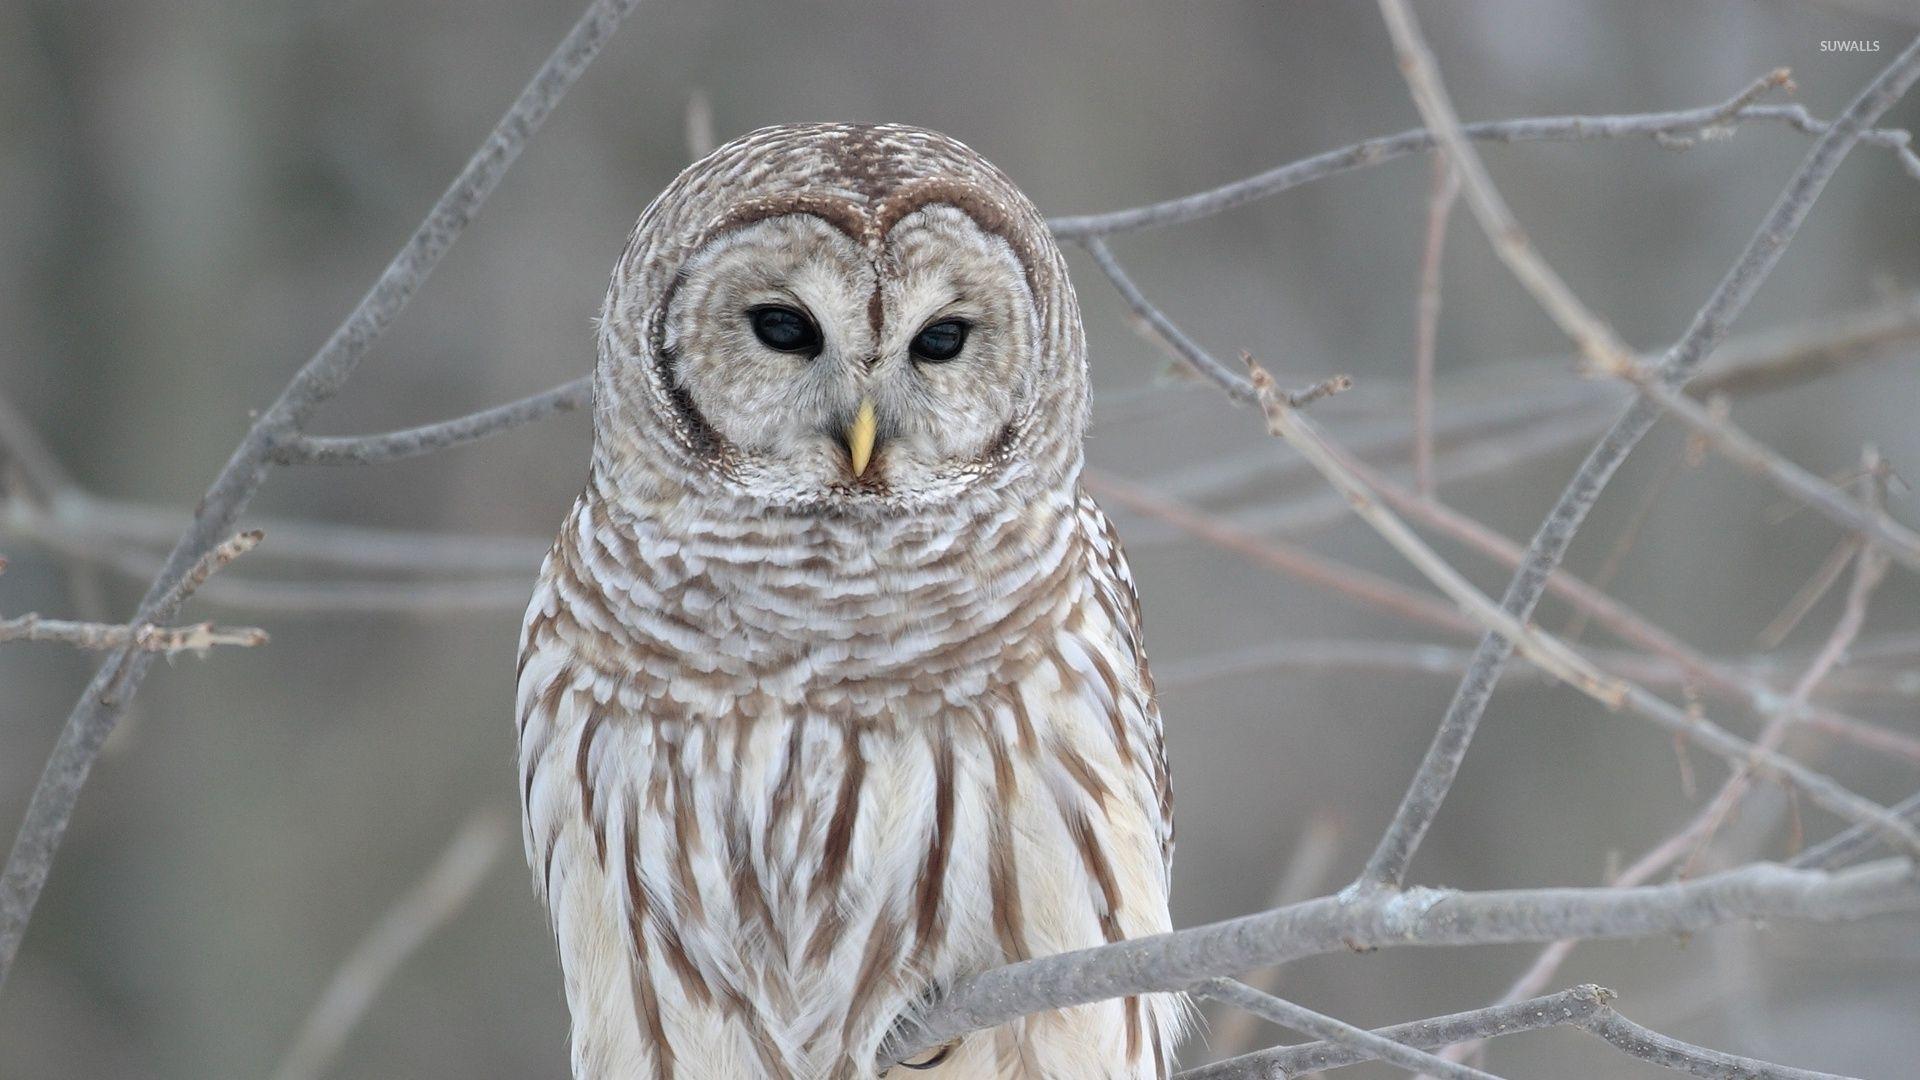 Wallpaper Owl Strix Asus Hd 4k Creative Graphics 10199: Top Free Owl Backgrounds